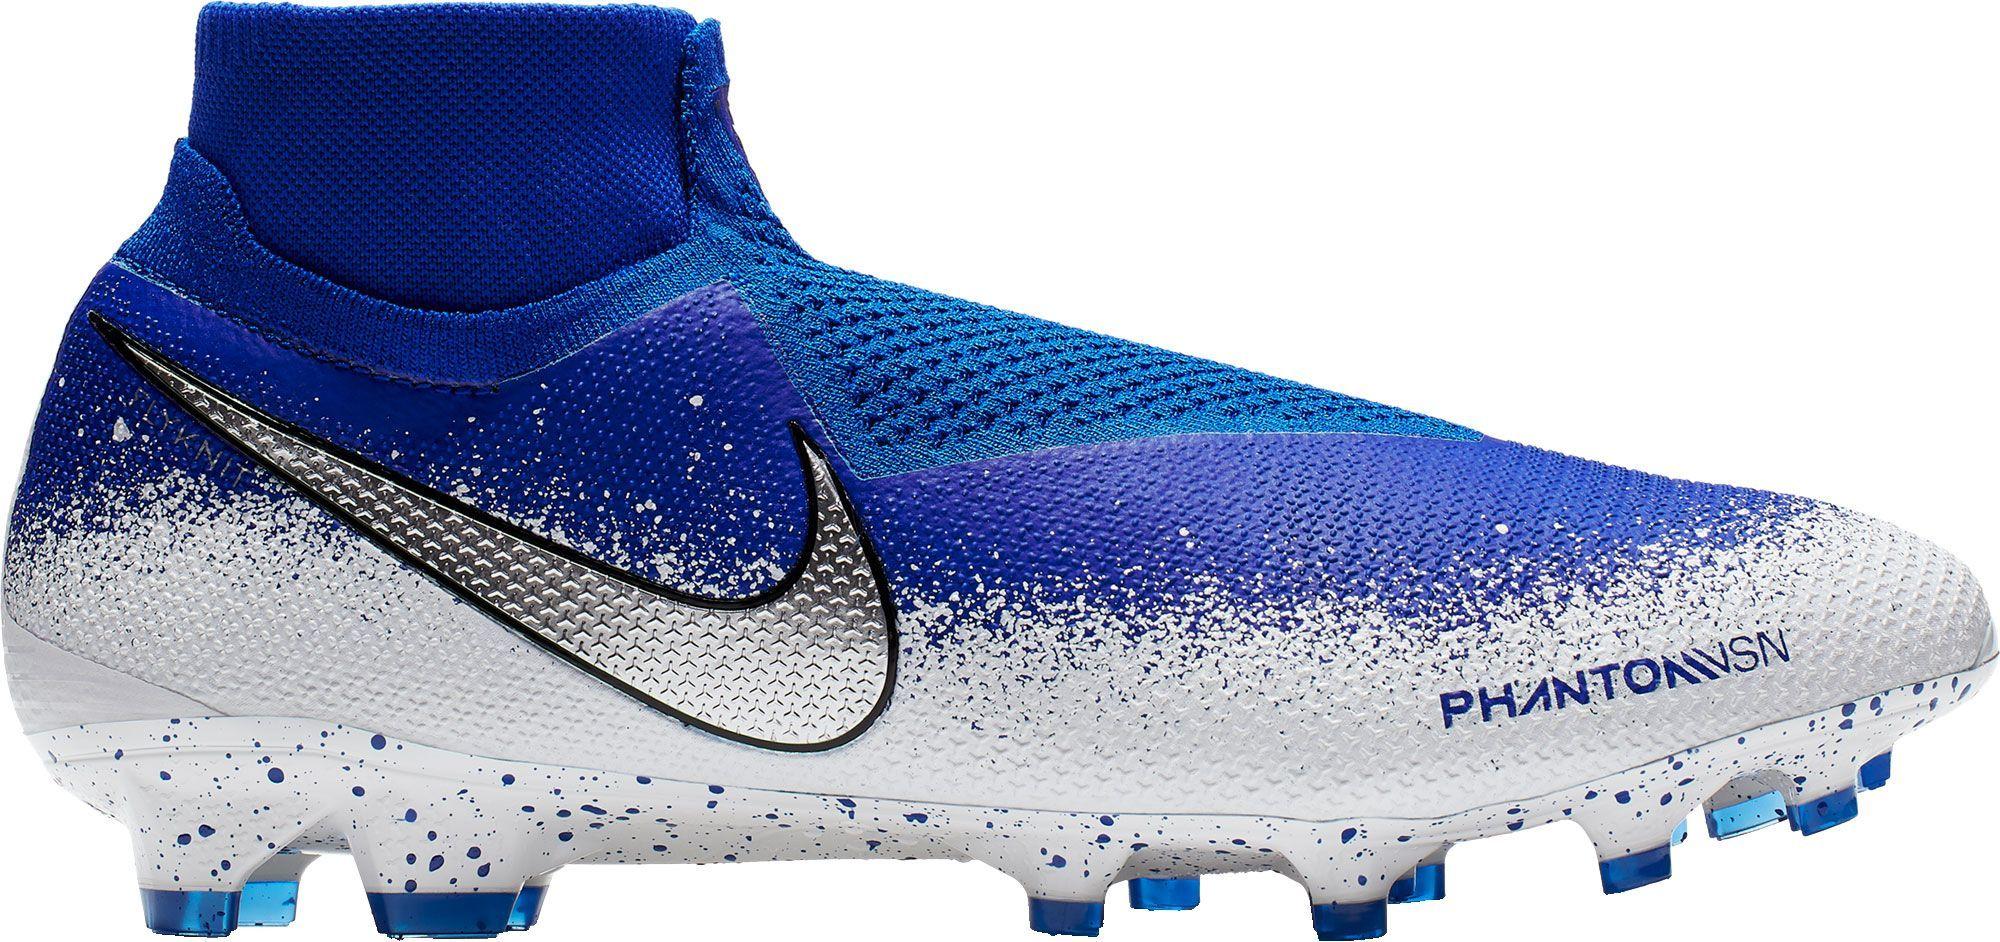 Nike Phantom Vision Elite Dynamic Fit FG Fu ballschuhe